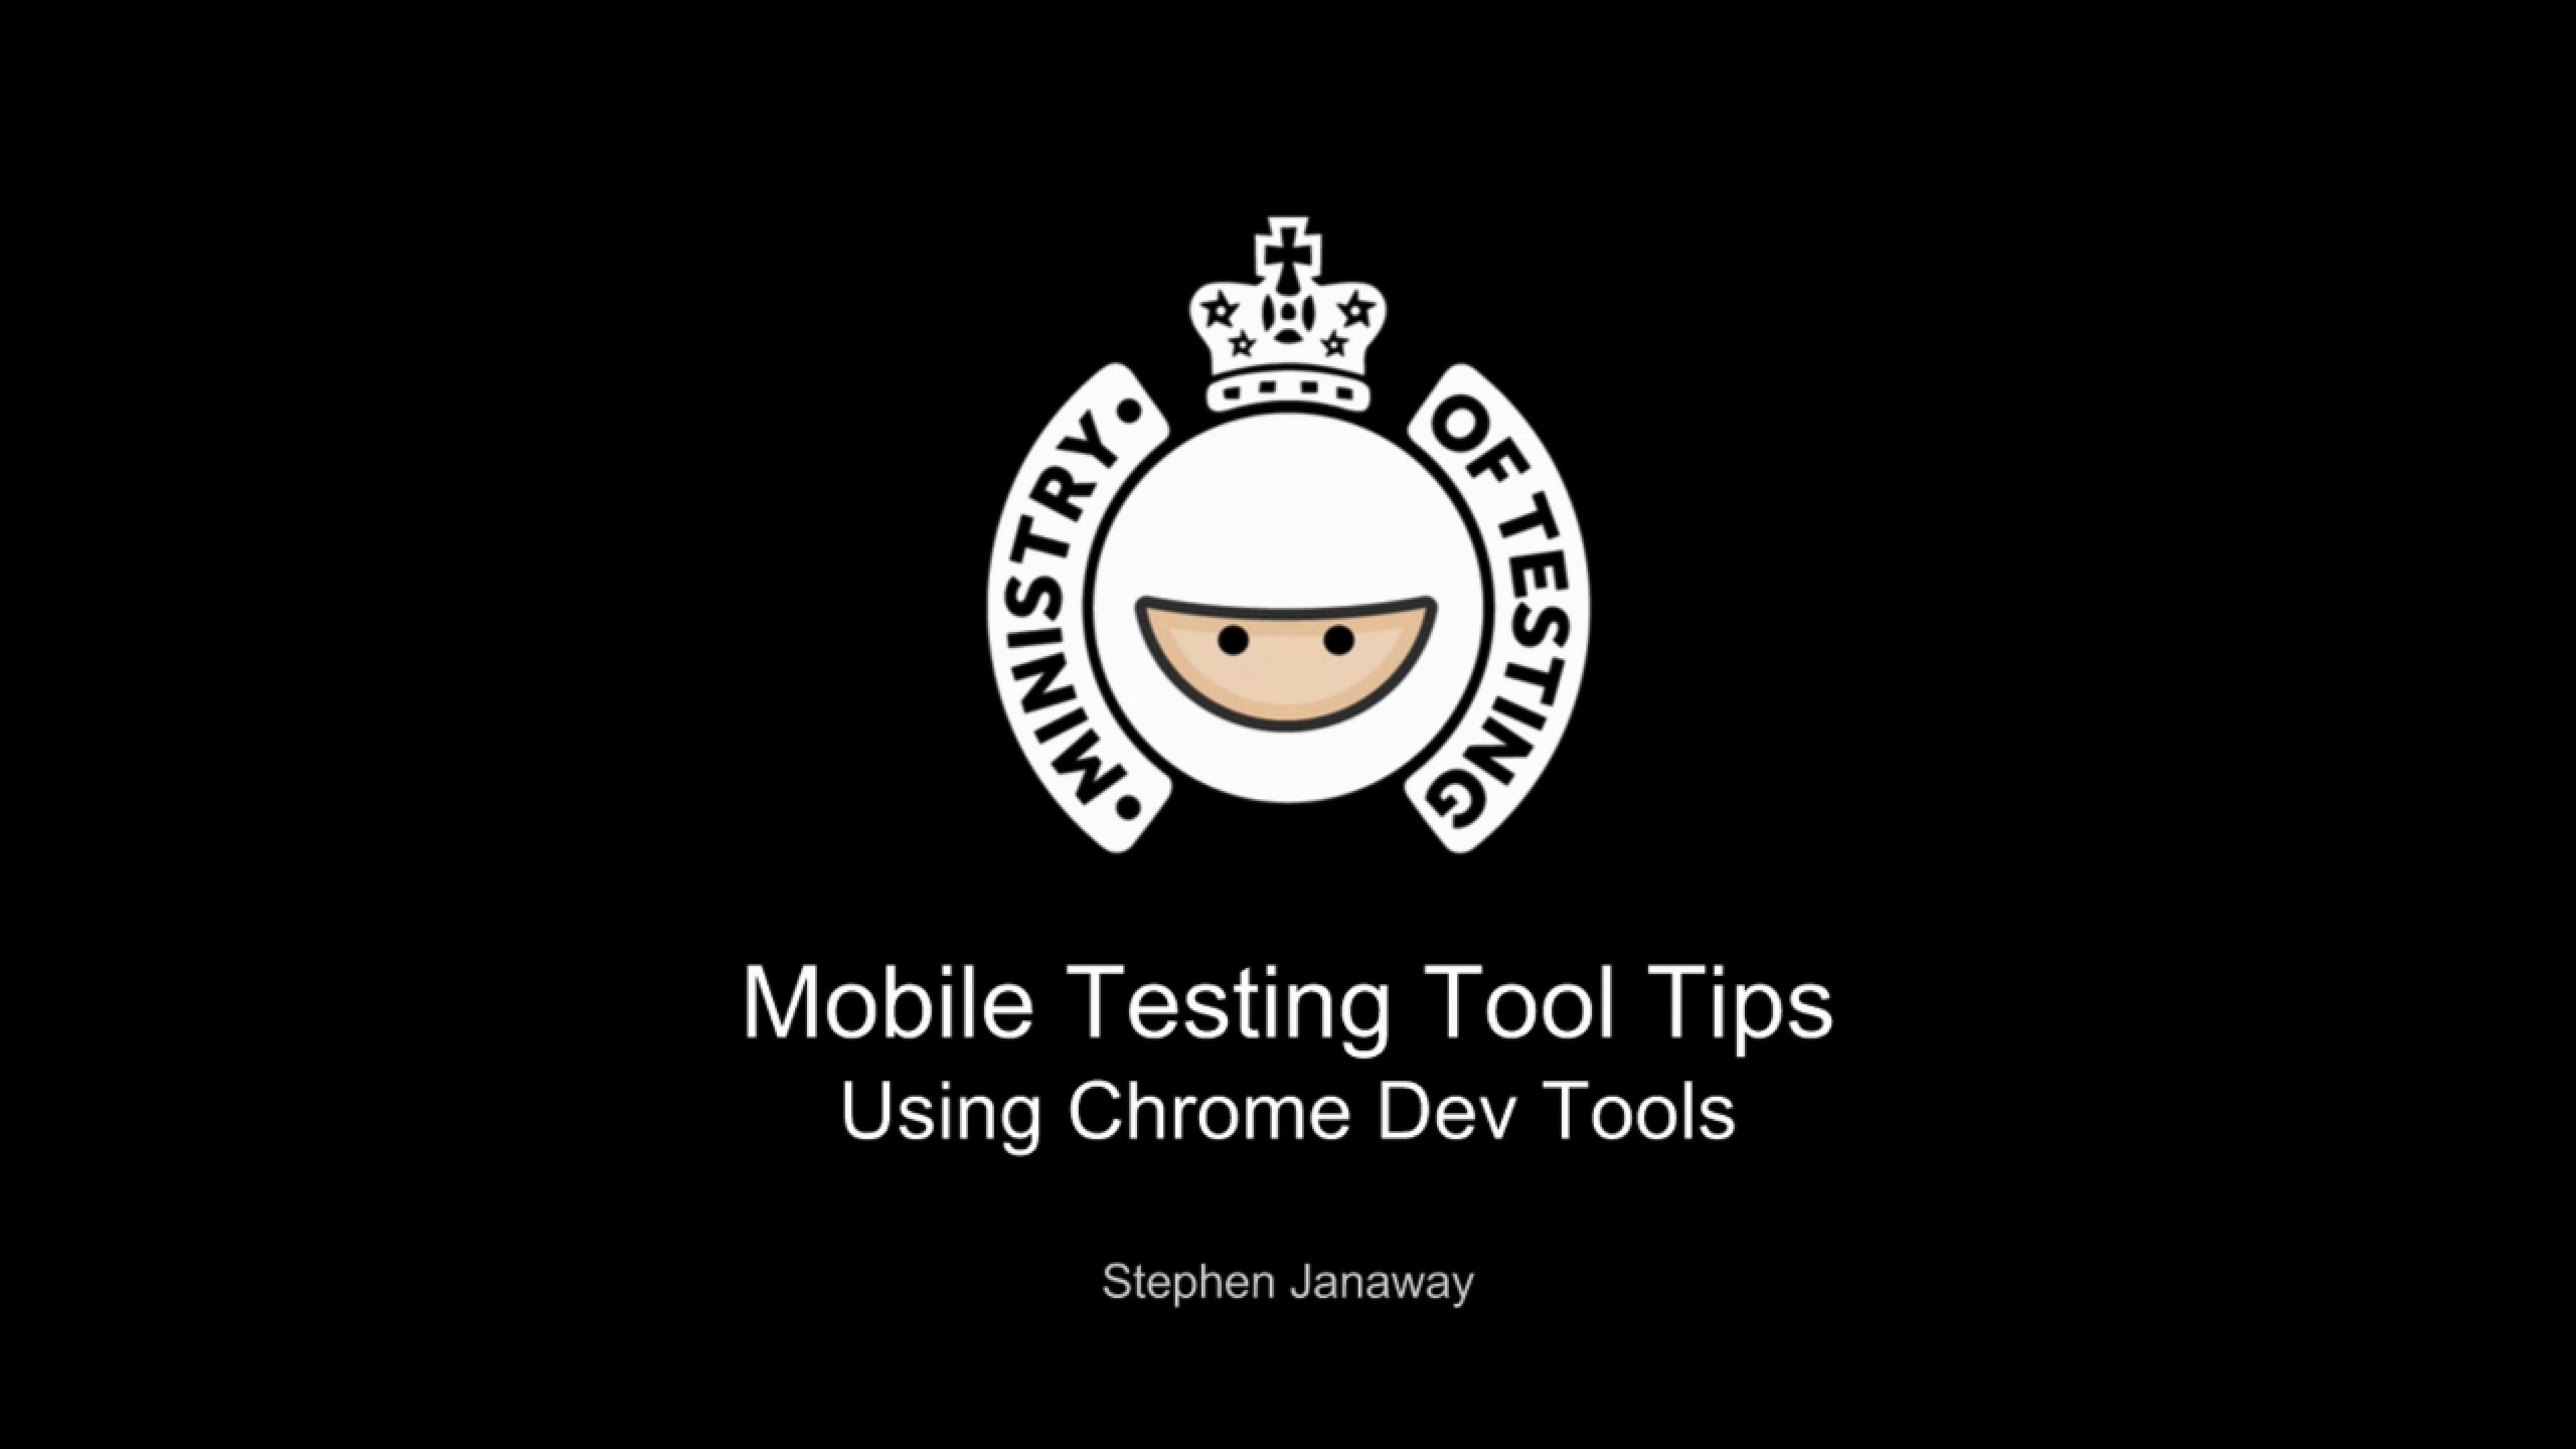 Using the Chrome Developer Tools for Mobile Testing